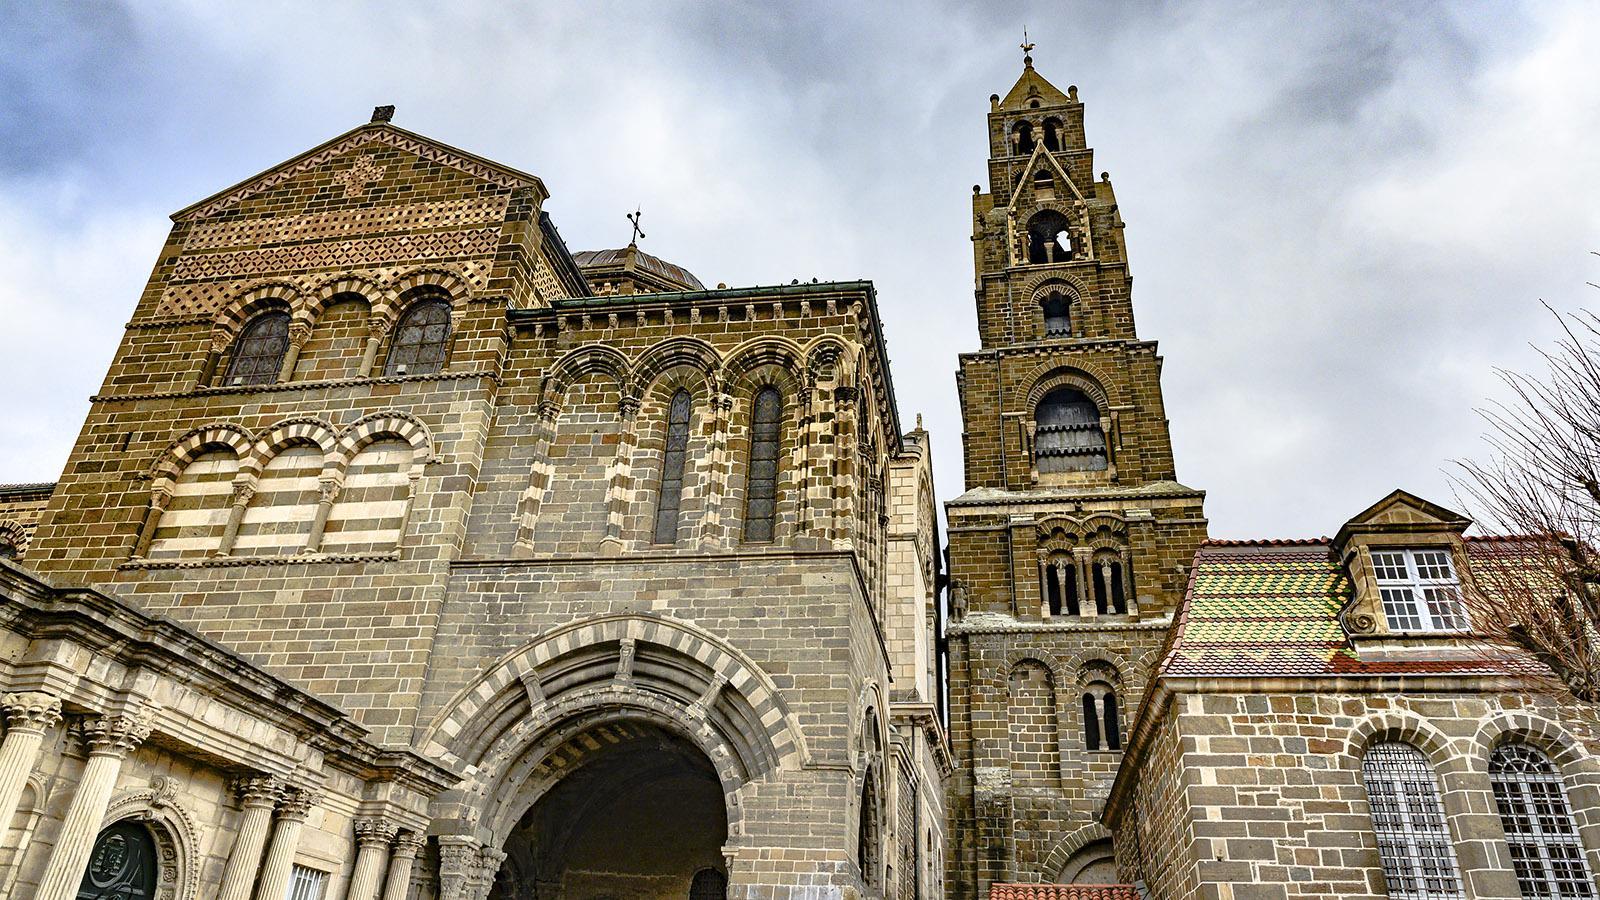 Die Kathedrale von Le Puy-en-Velay. Foto: Hilke Maunder